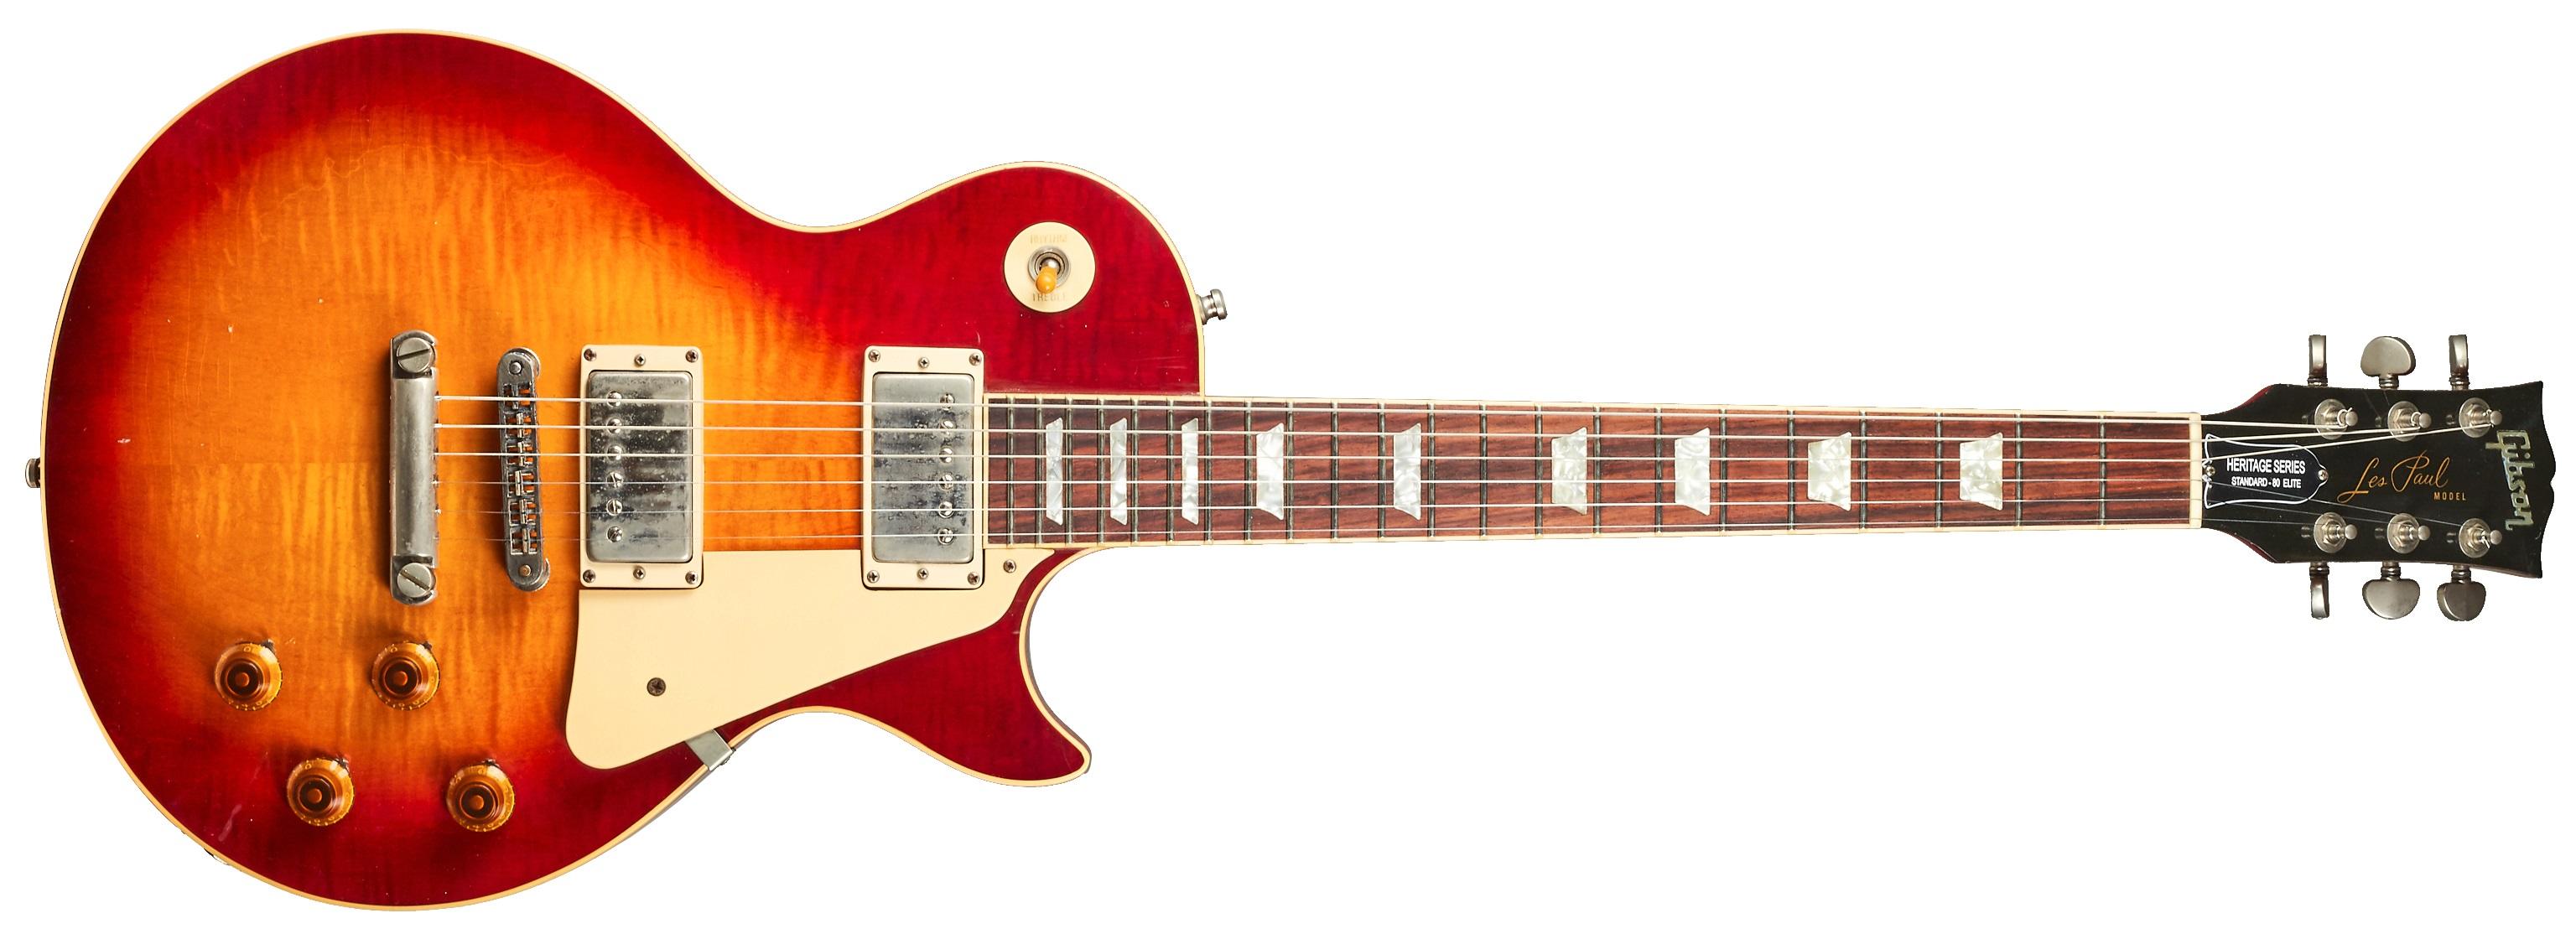 Gibson 1981 Les Paul Heritage Standard